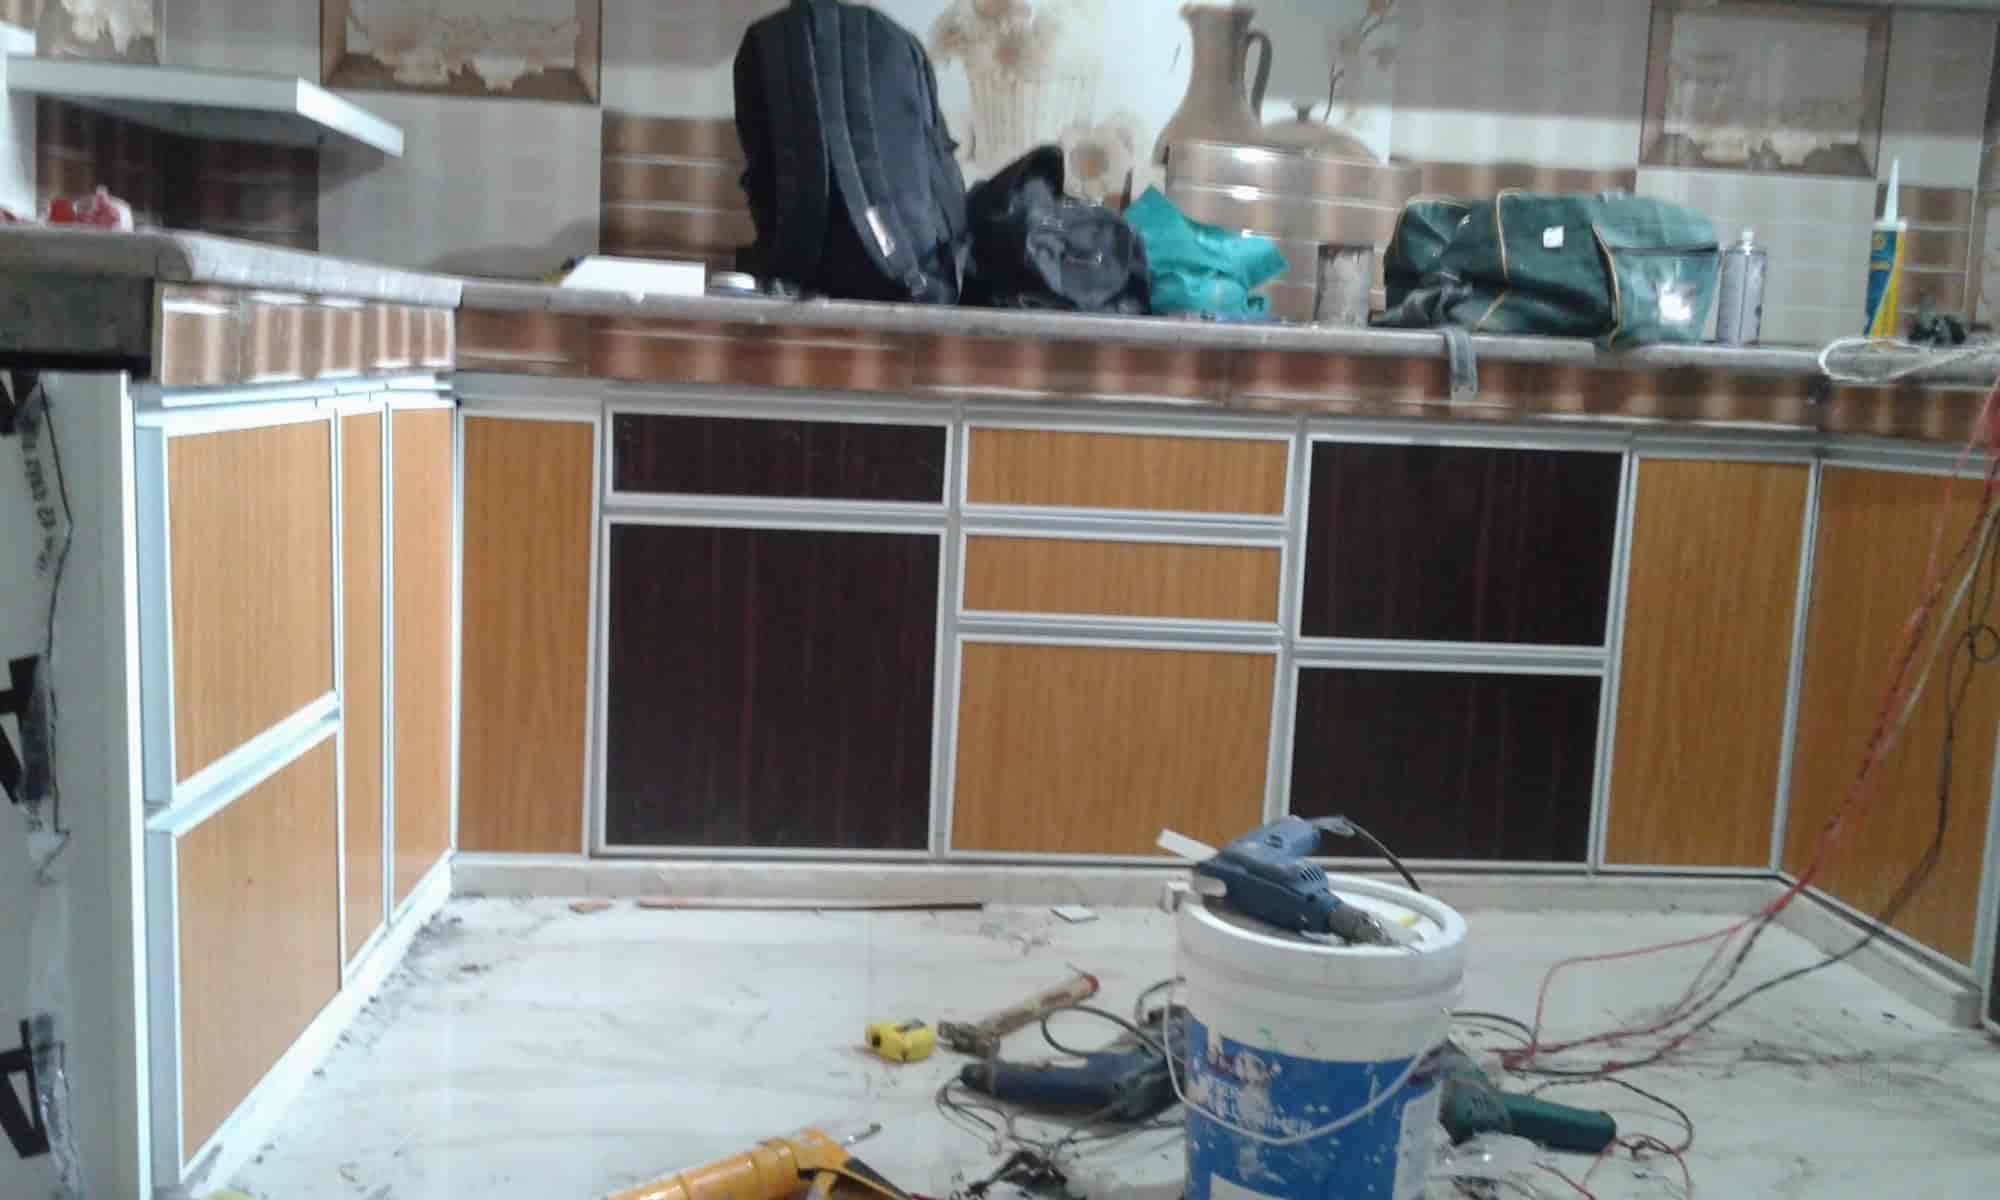 Amrit Modular Kitchen Photos, Tilak Nagar, Delhi- Pictures & Images ...